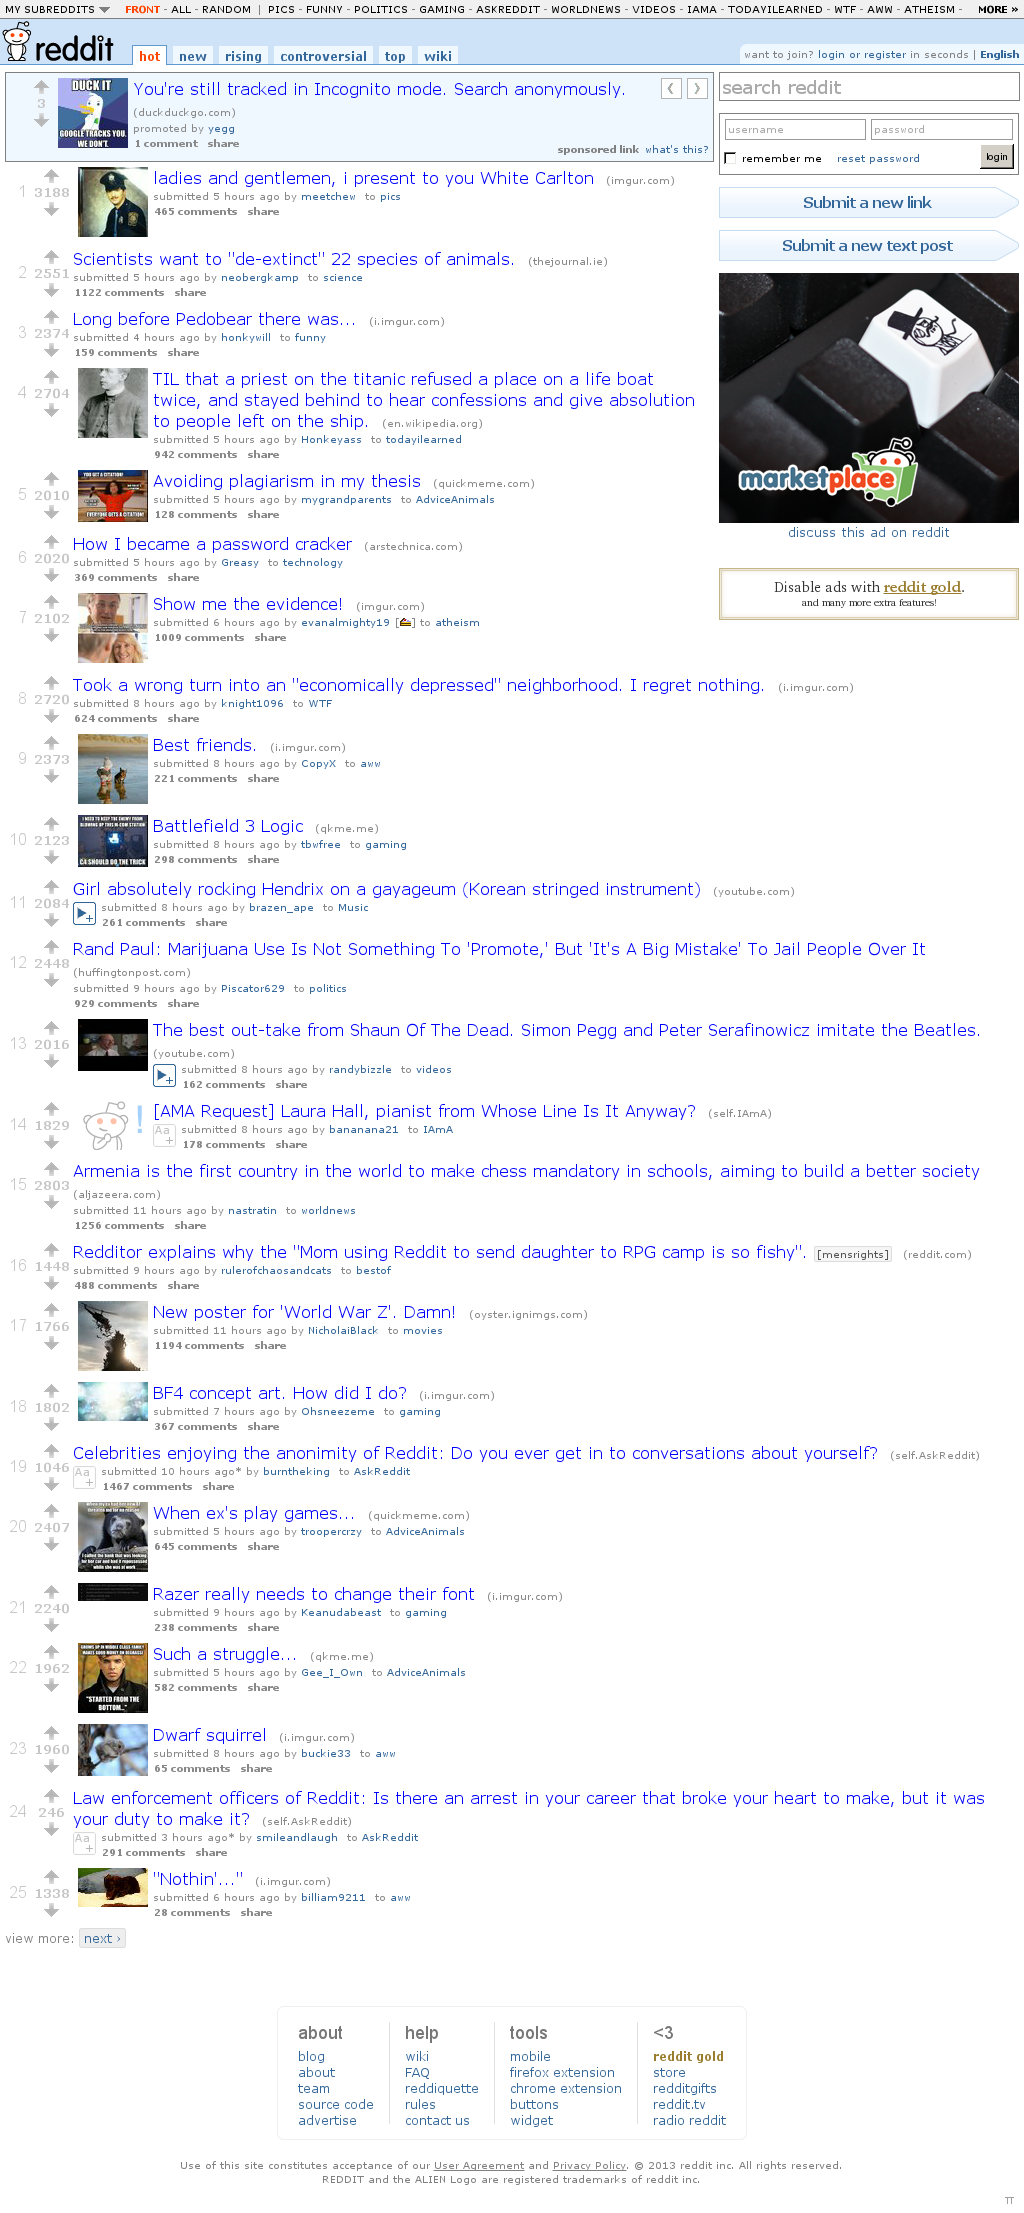 Reddit at Monday March 25, 2013, 7:37 a.m. UTC